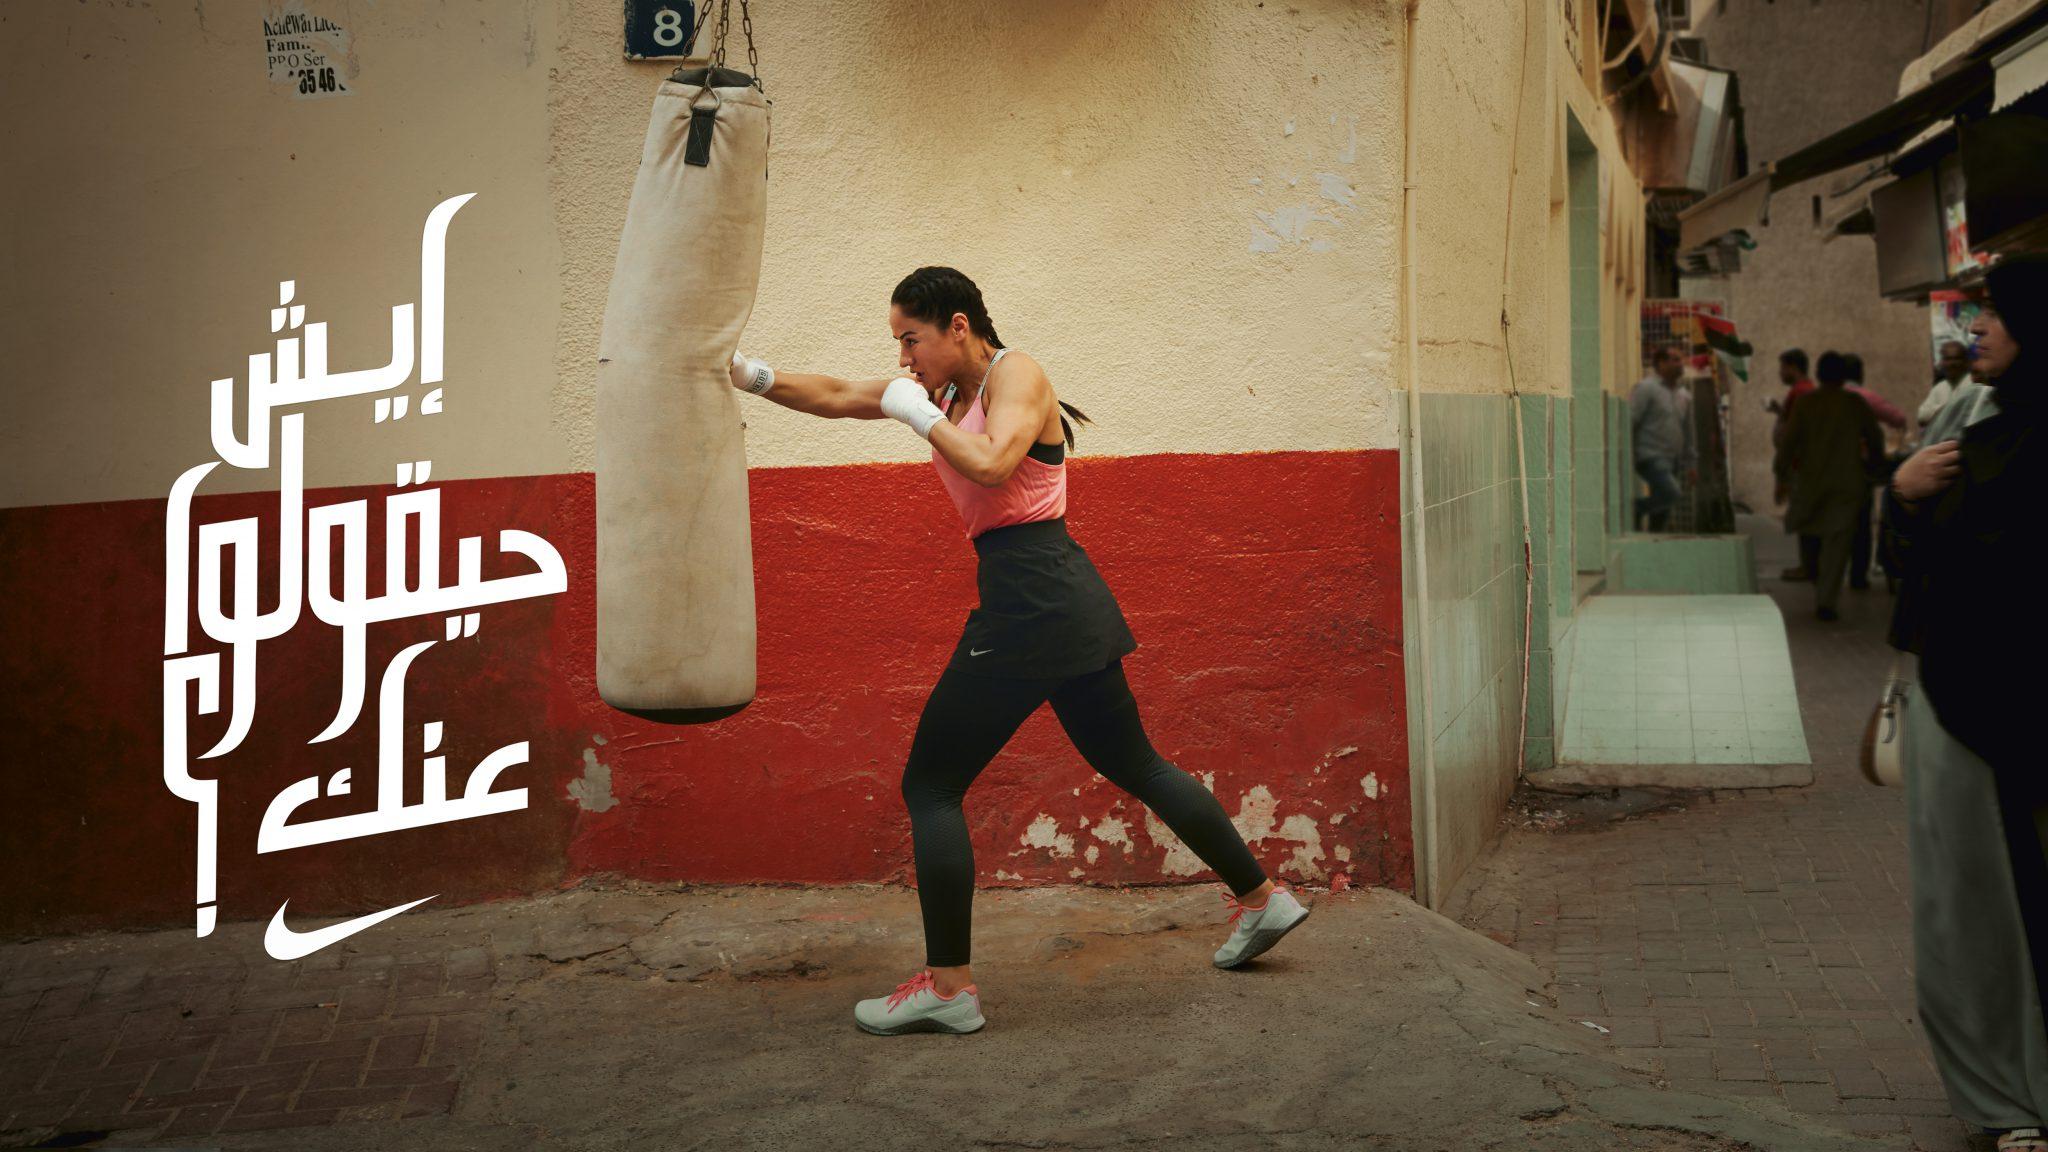 6906_Nike_Boxing_R7_Artwork